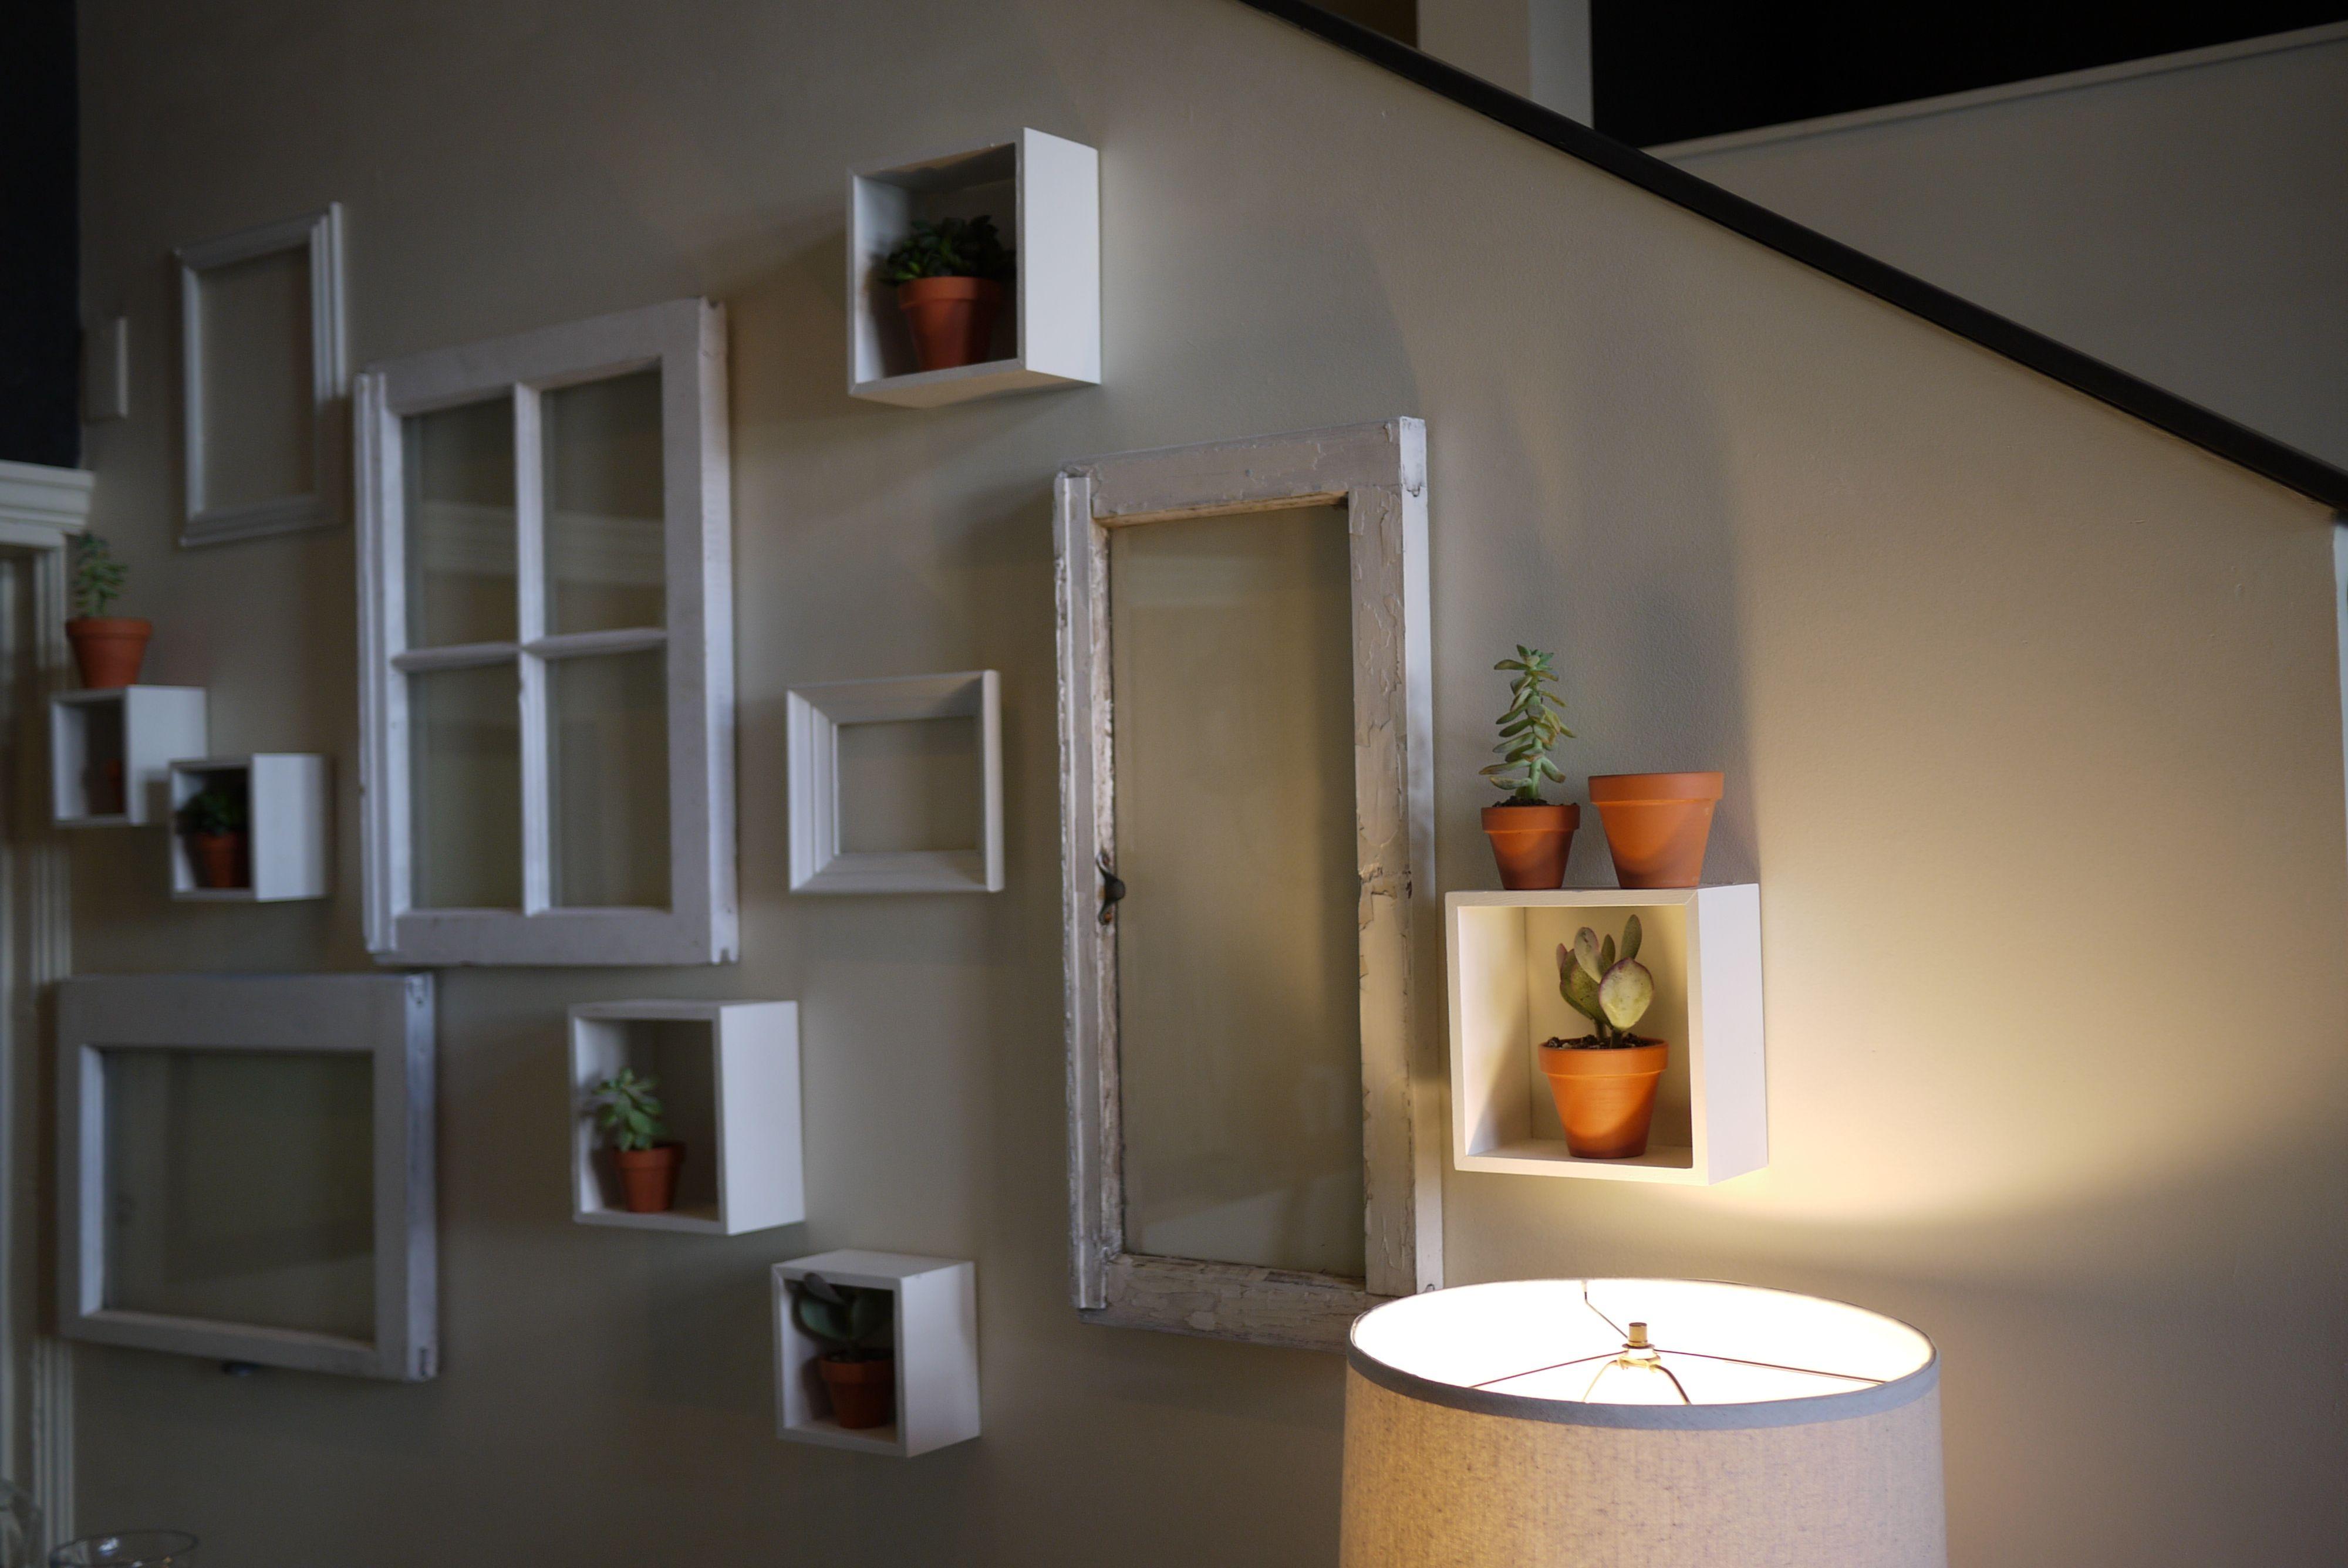 6 pane window frame ideas  whitewashed walls  vintage windows  succulents ryan  living